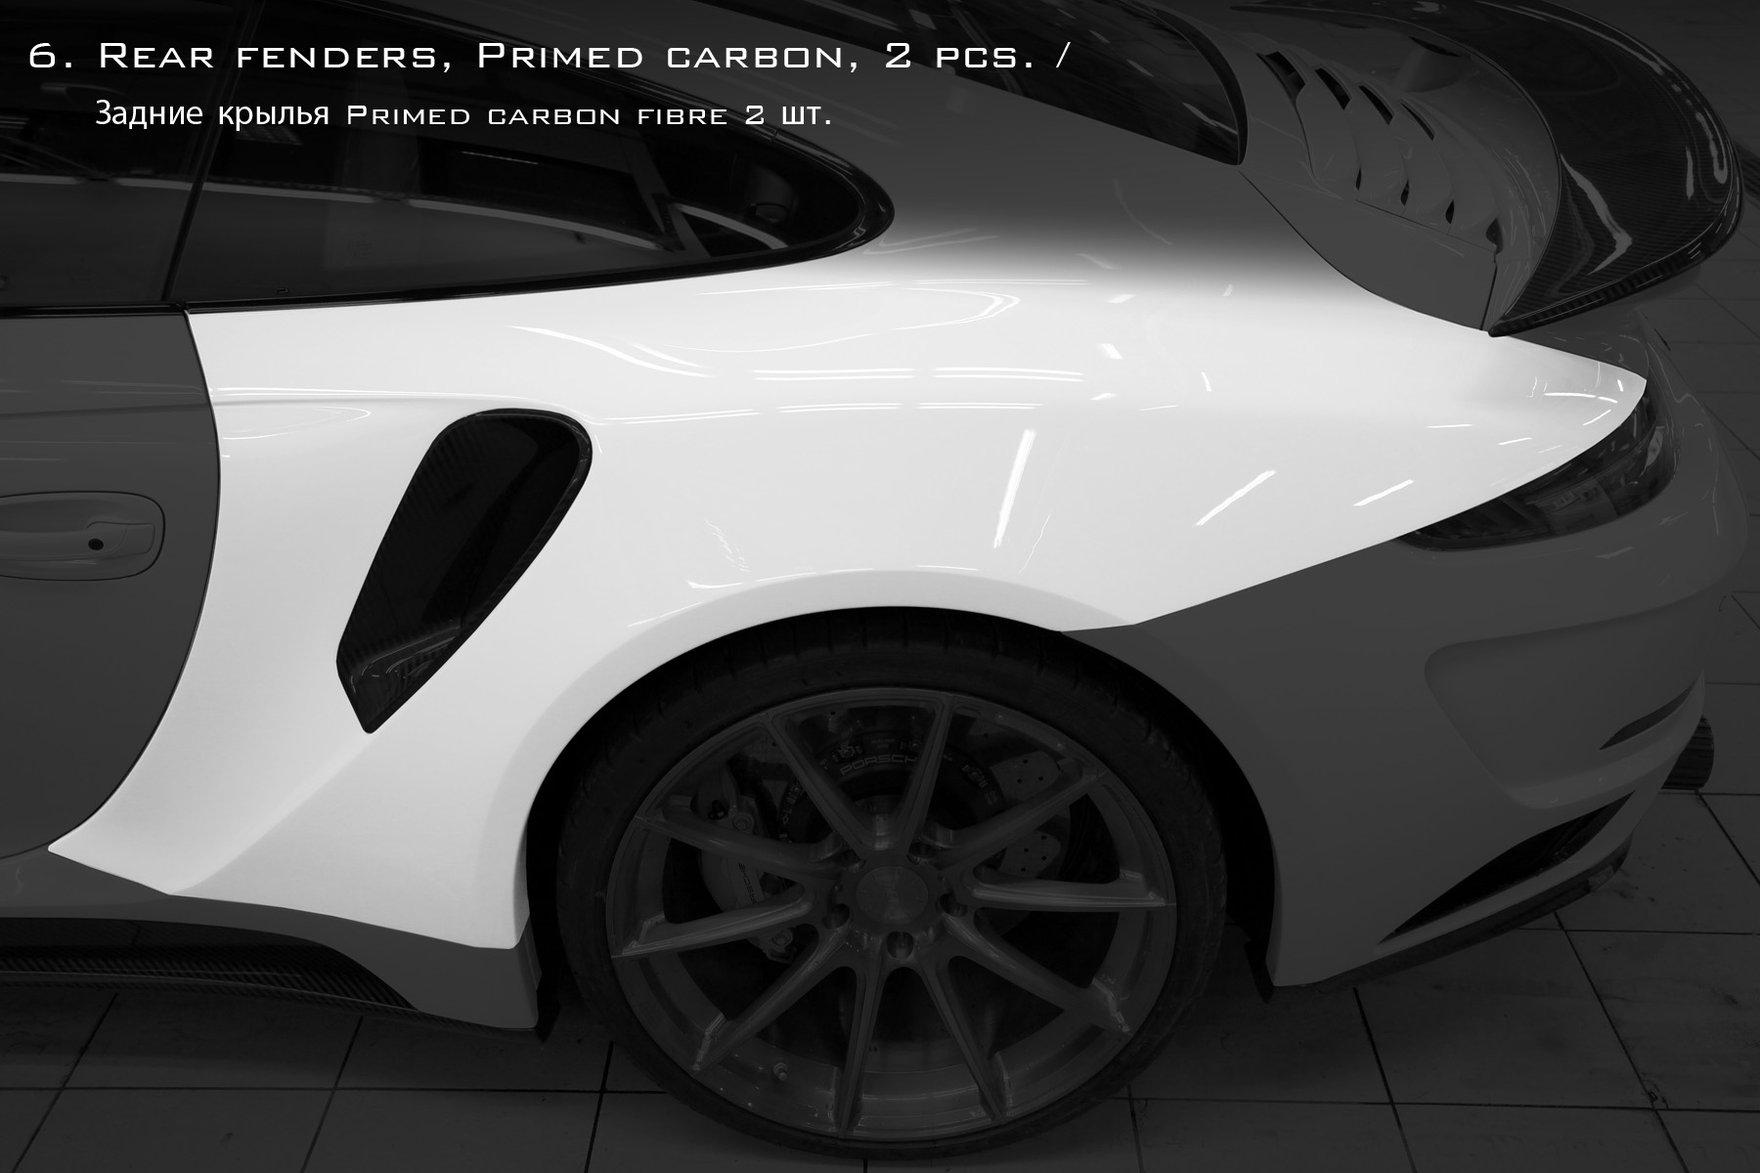 tuning porsche 991 turbo turbo s stinger gtr turbo topcar. Black Bedroom Furniture Sets. Home Design Ideas